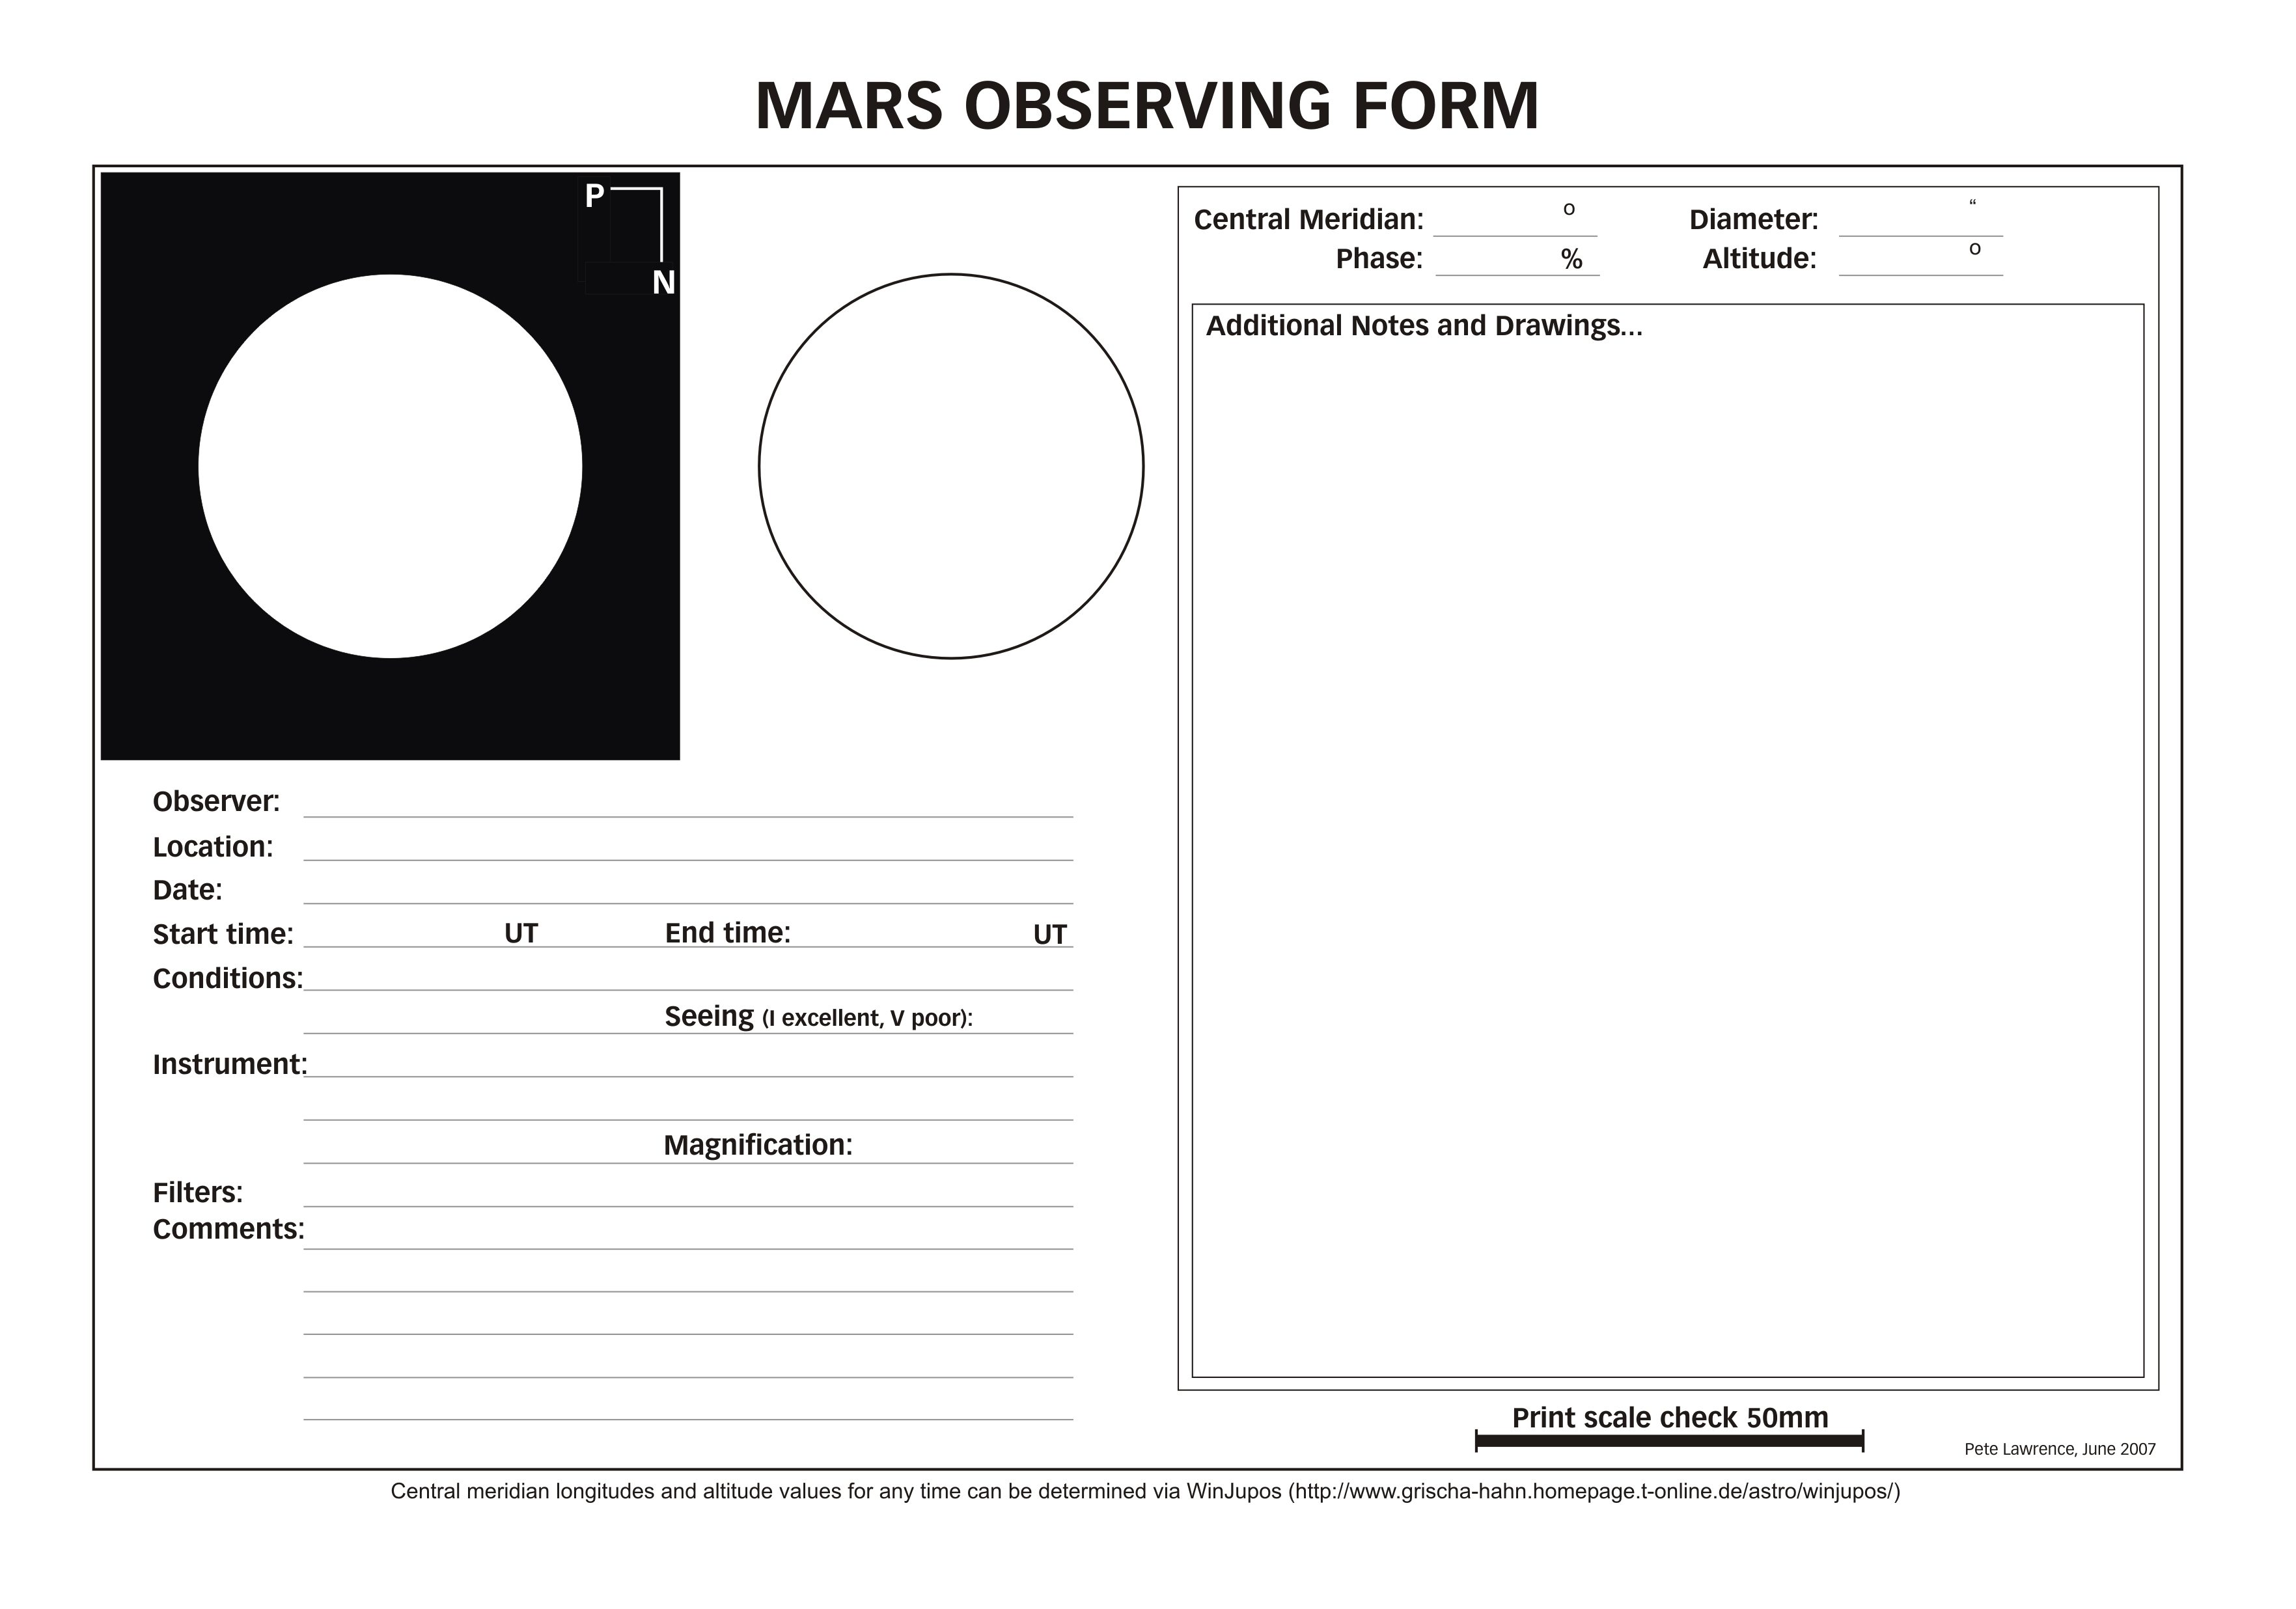 Worksheets Mark Mcintyre Astrophotography